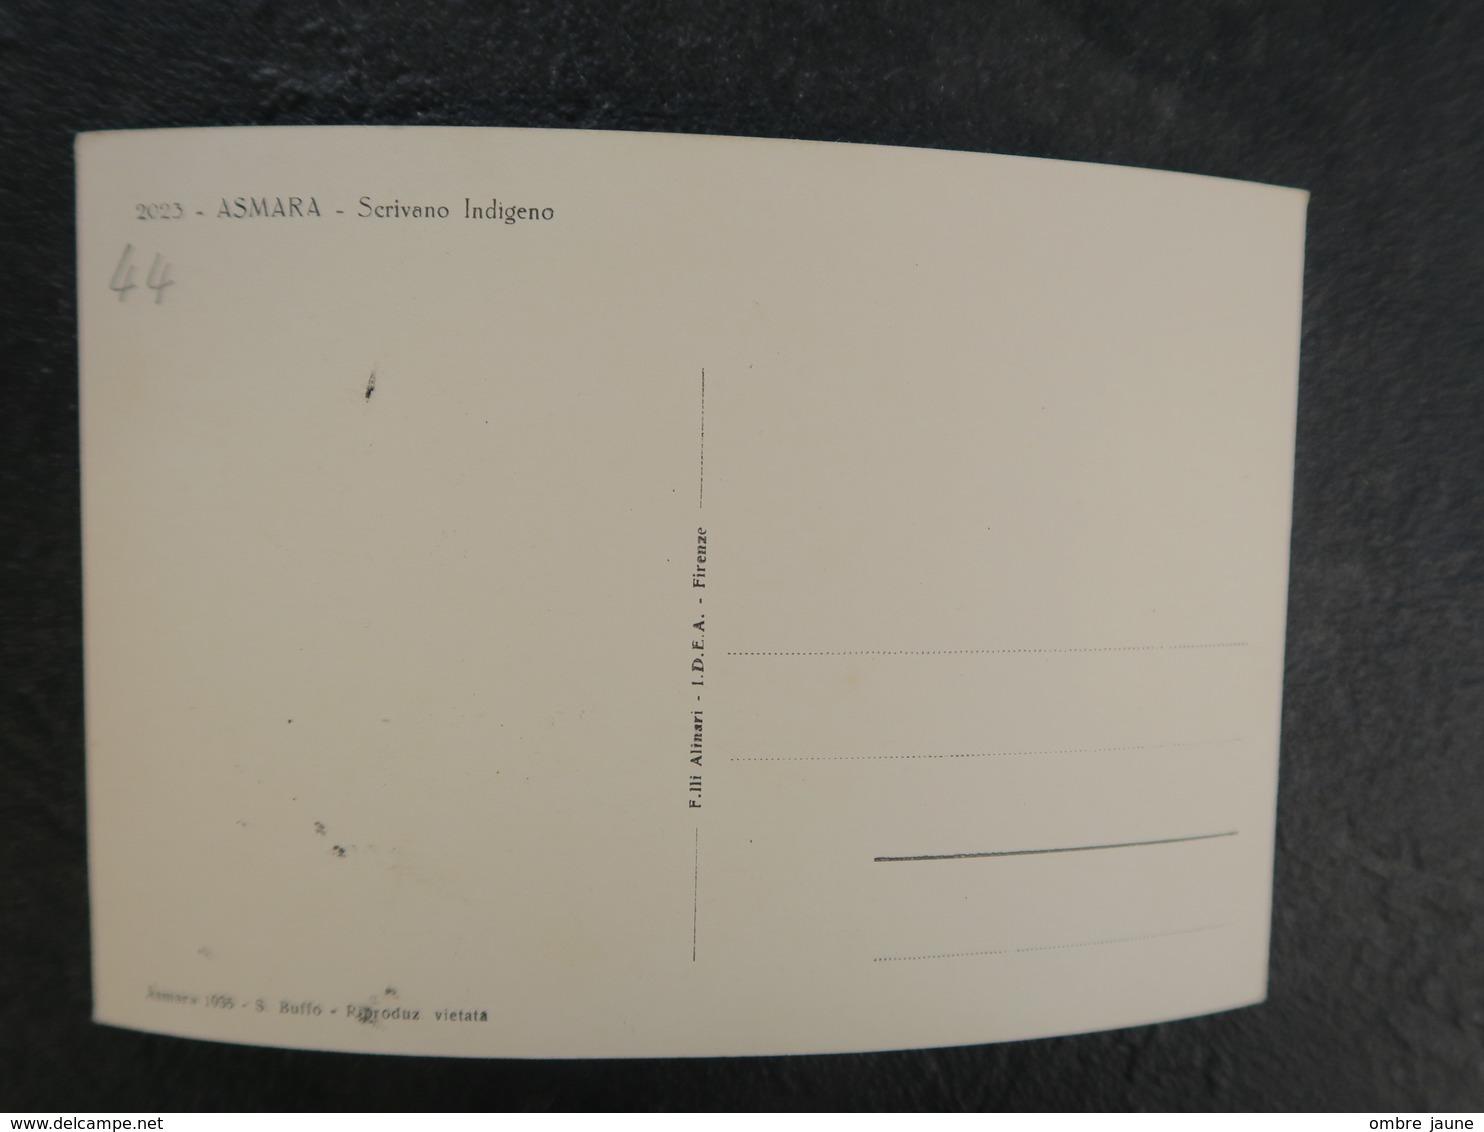 IT  - ERYTHREE - ERITREA - ASMARA - SCRIVANO INDIGENO - Eritrea